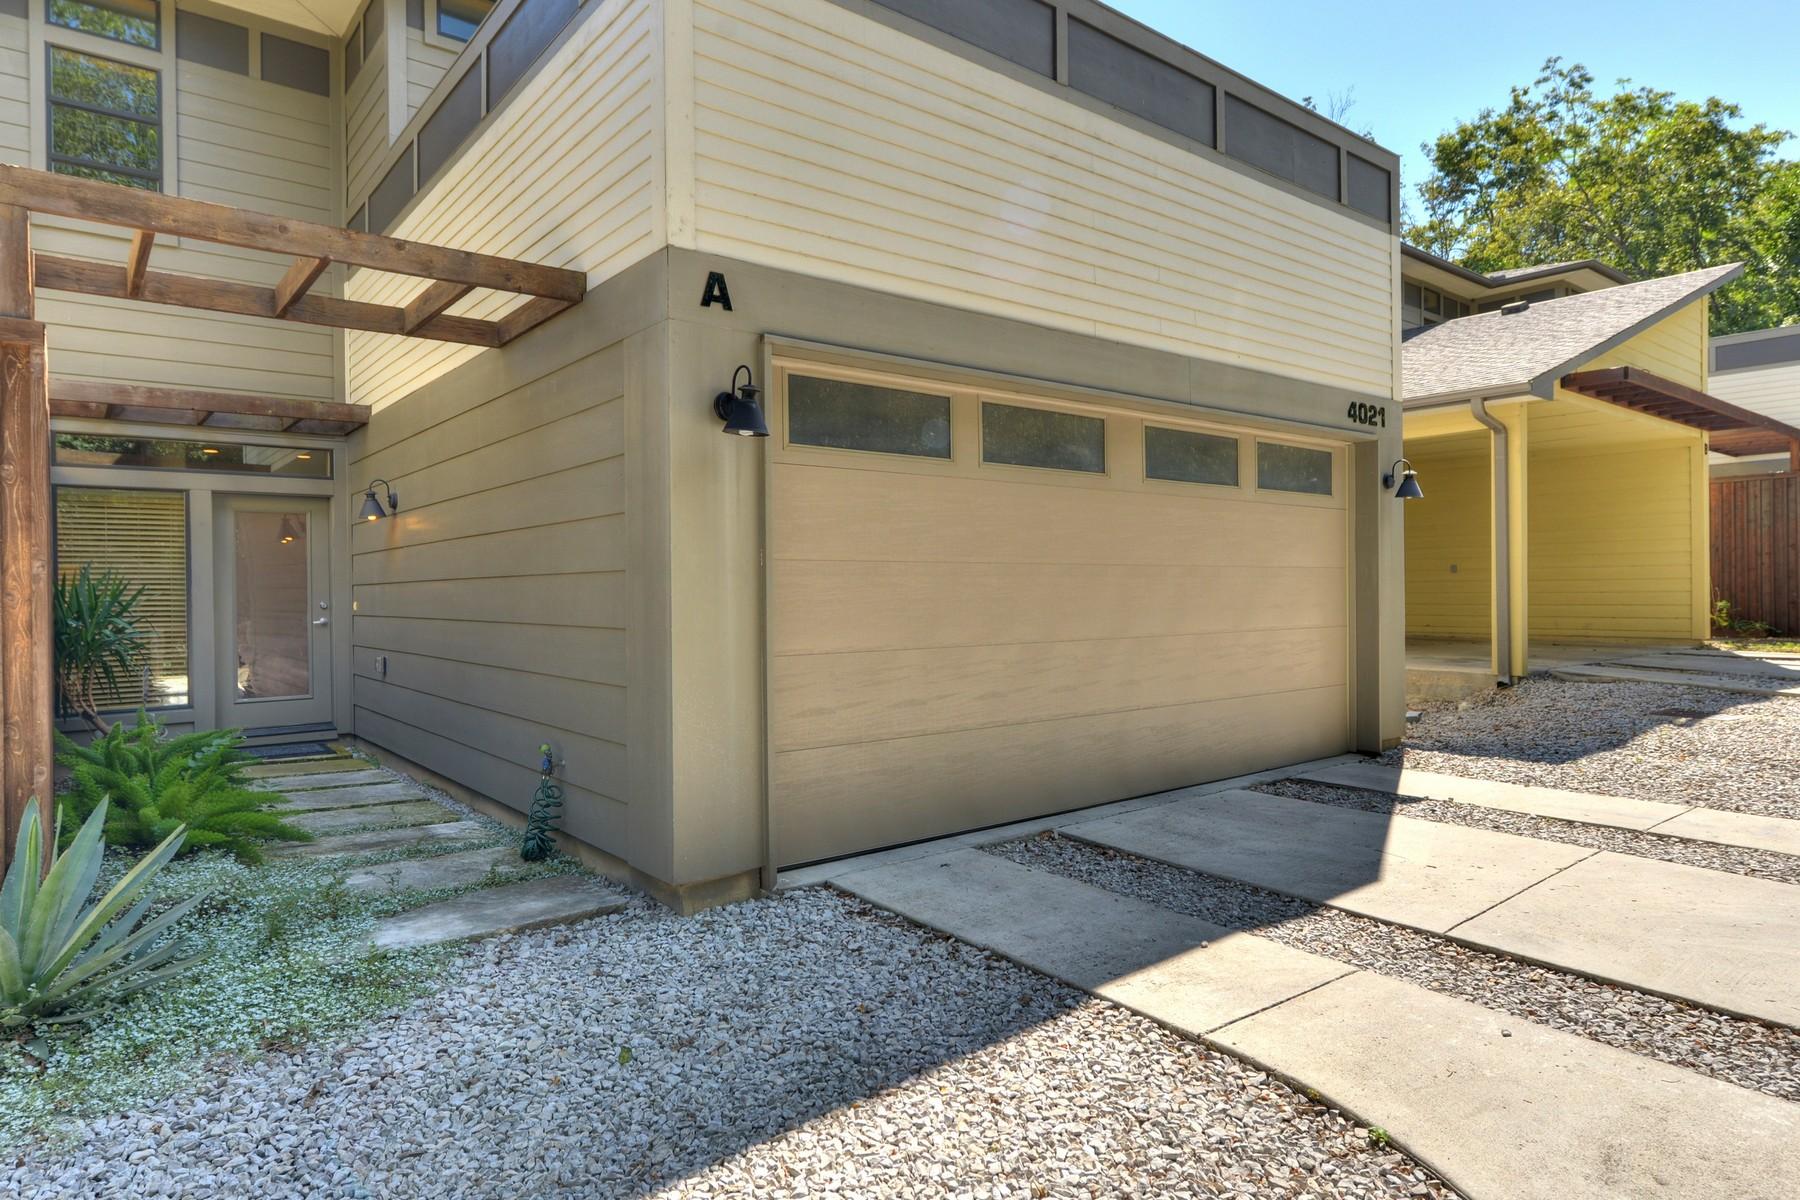 Condominium for Sale at Fantastic Location Near South Lamar! 4021 Valley View Rd A Austin, Texas 78704 United States